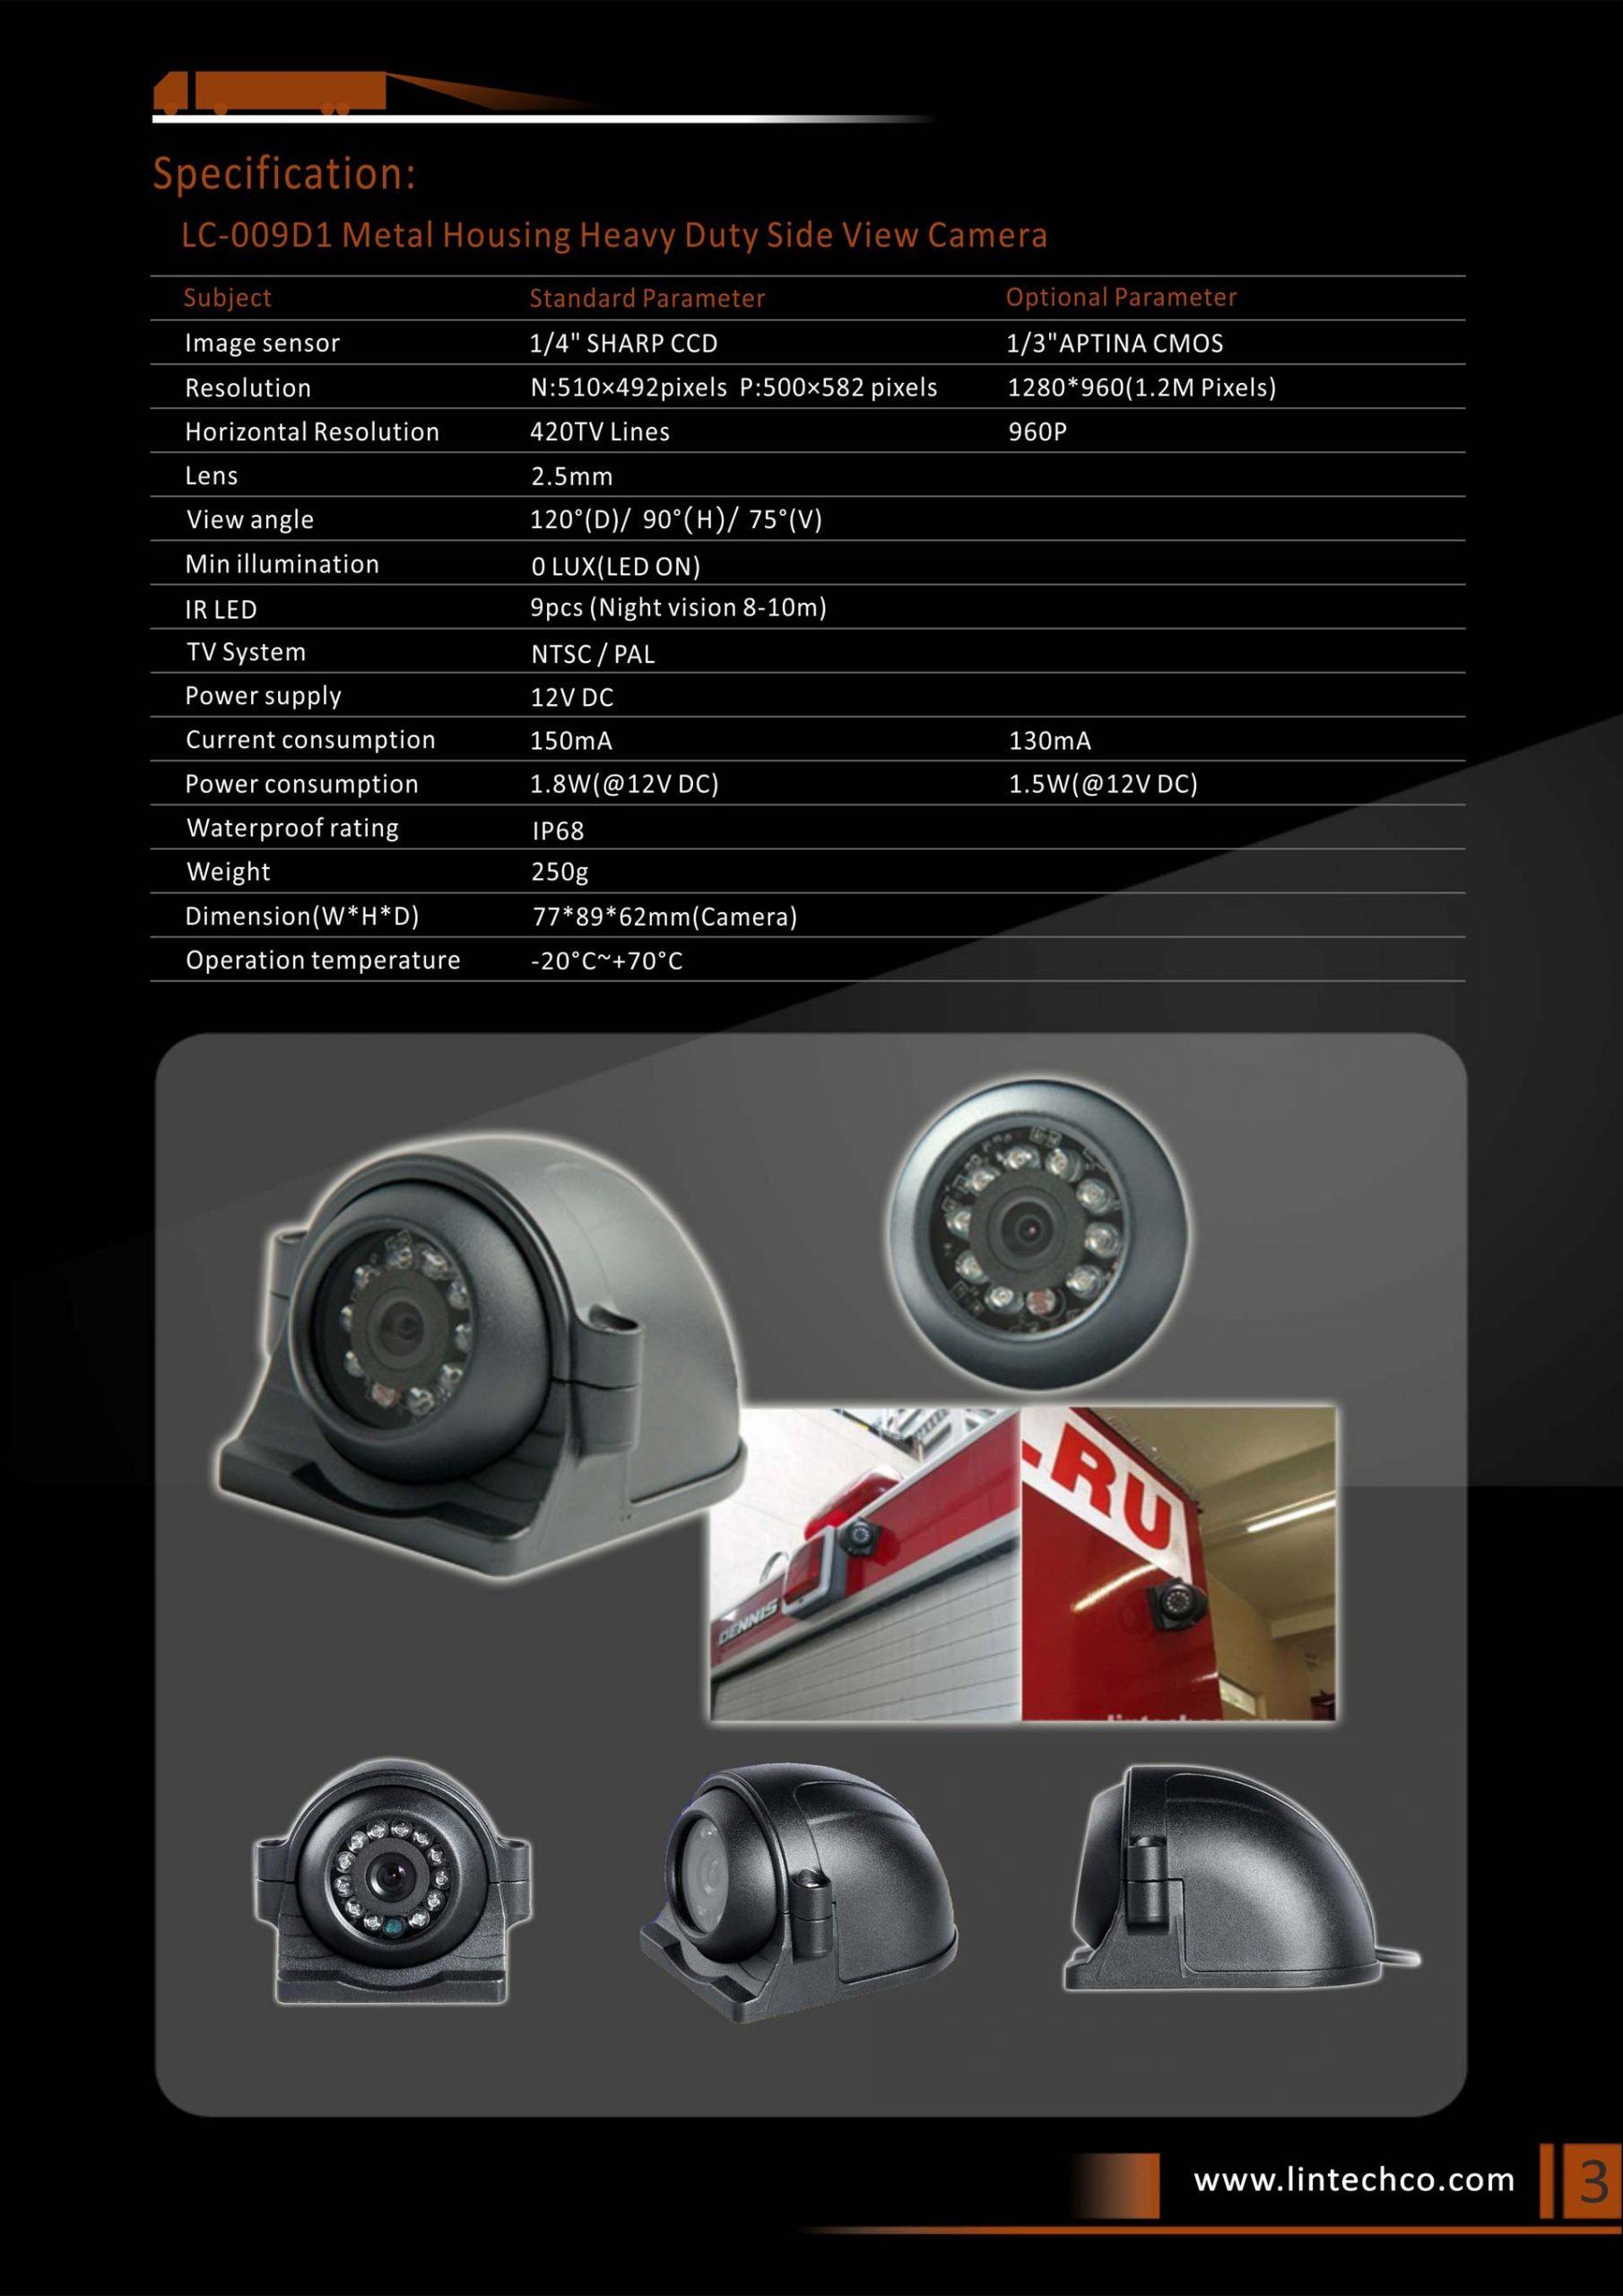 3.Metal Housing Heavy Duty Side View Camera